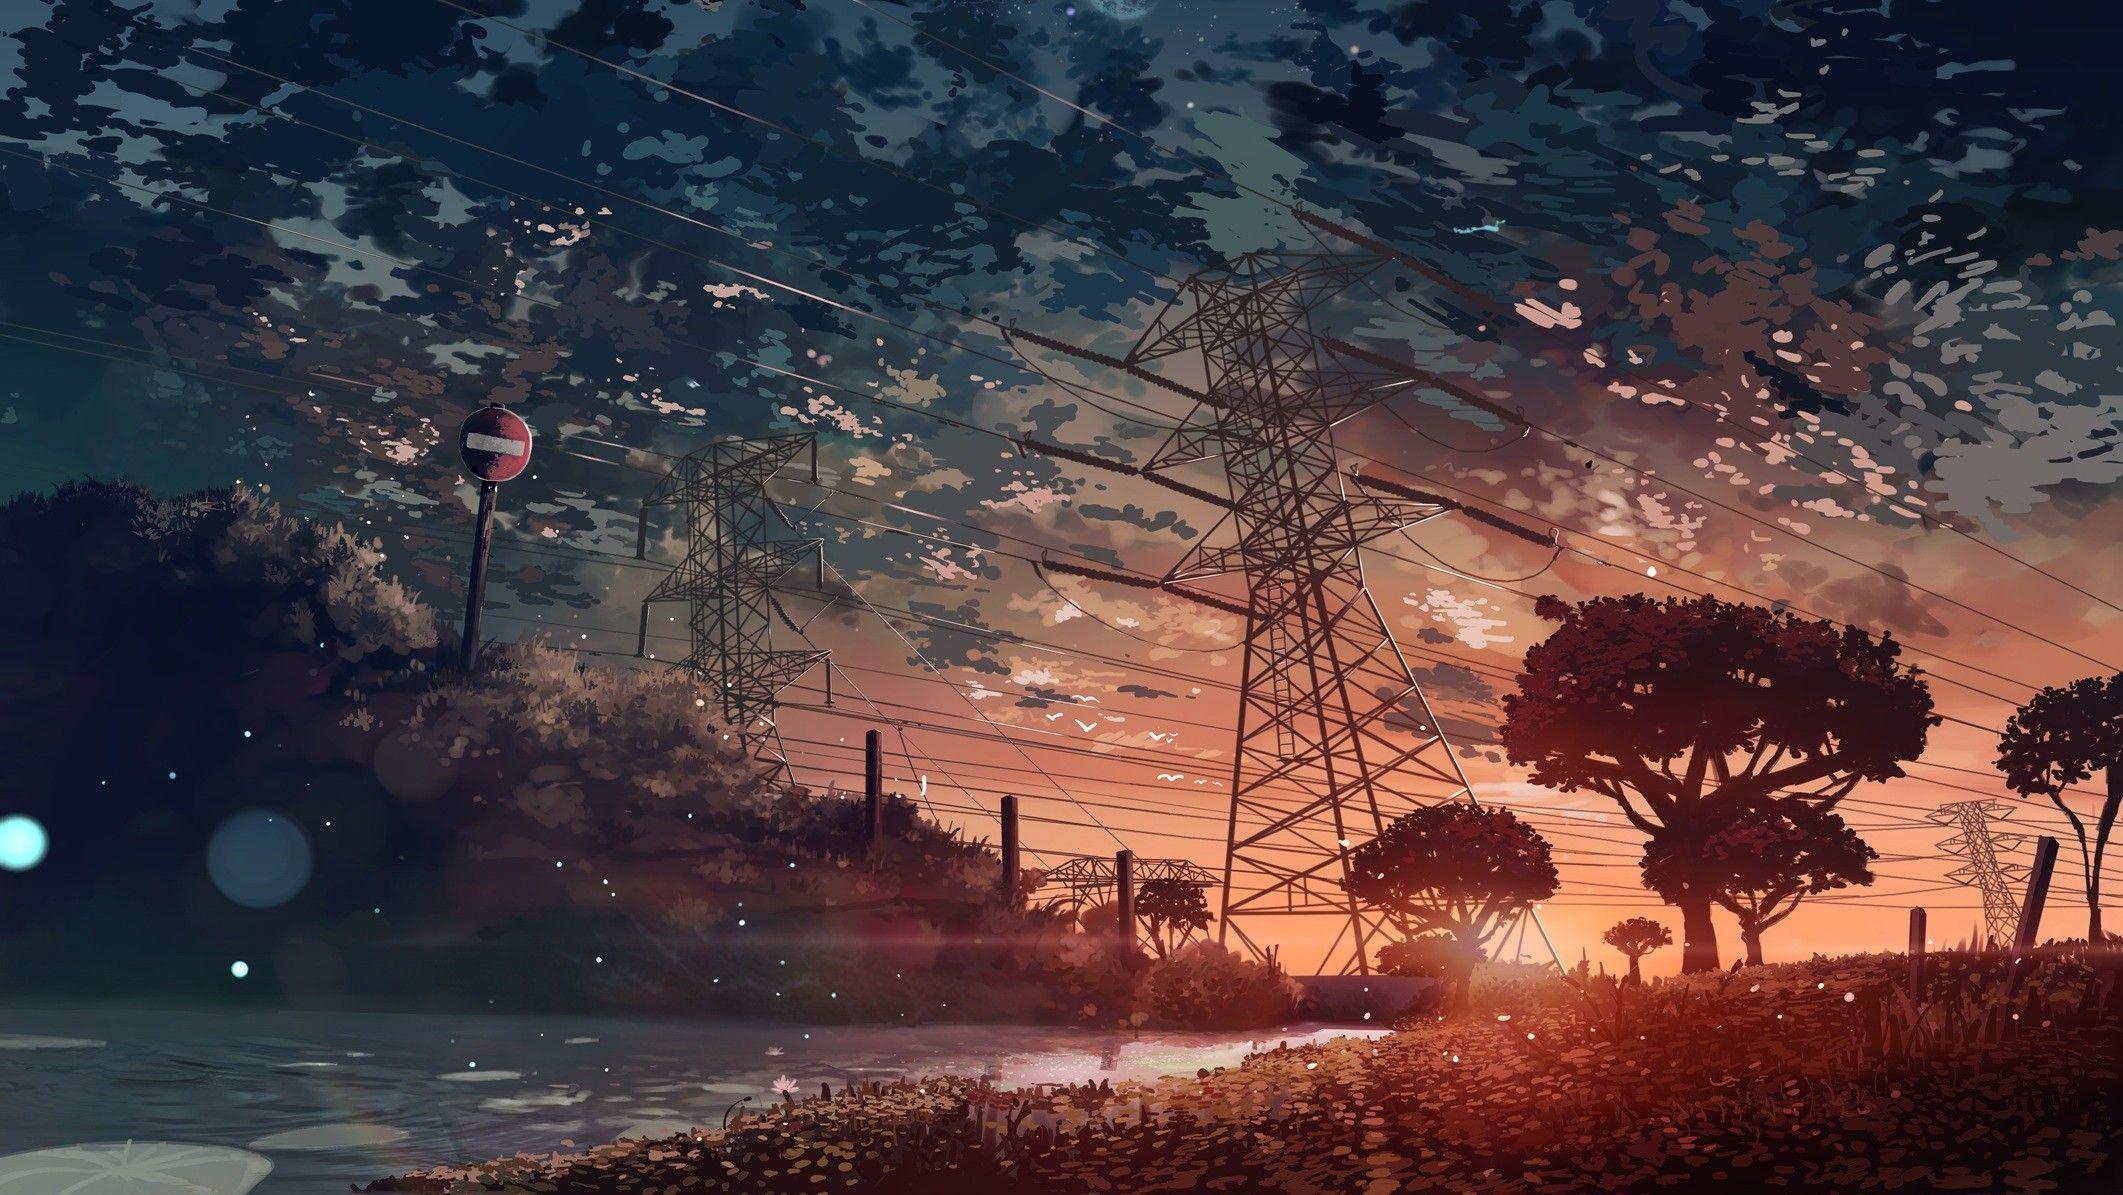 Anime Digital Art Wallpapers Top Free Anime Digital Art Backgrounds Wallpaperaccess